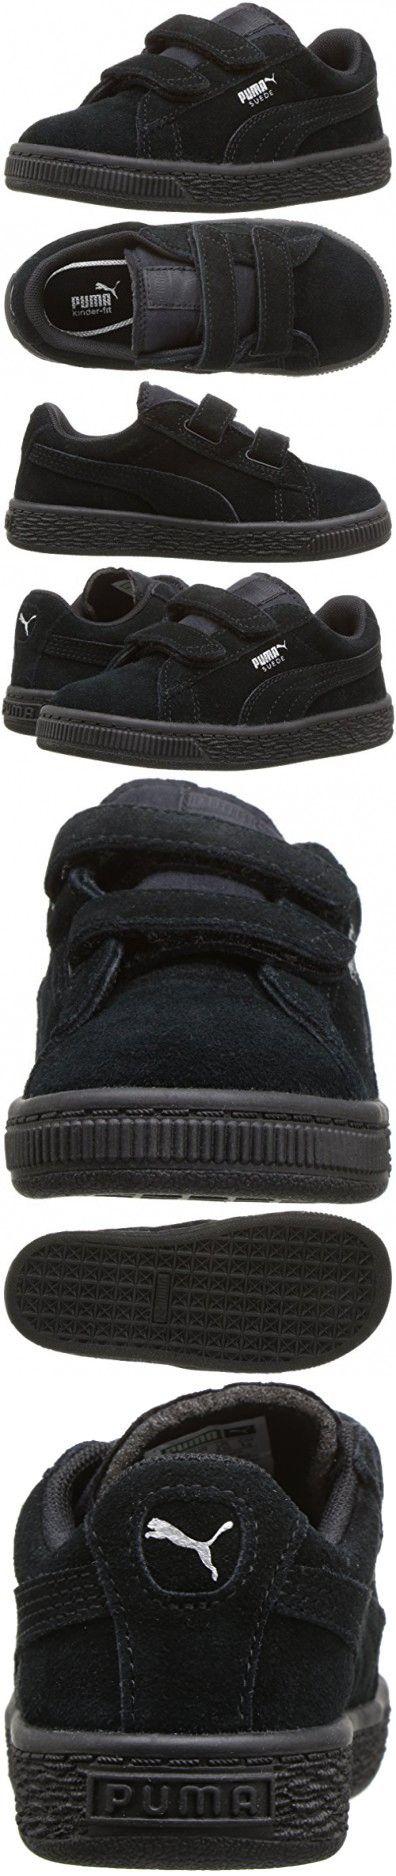 PUMA Baby Suede 2 Straps Kids Sneaker, Puma Black-Puma Silver, 8 M US Toddler